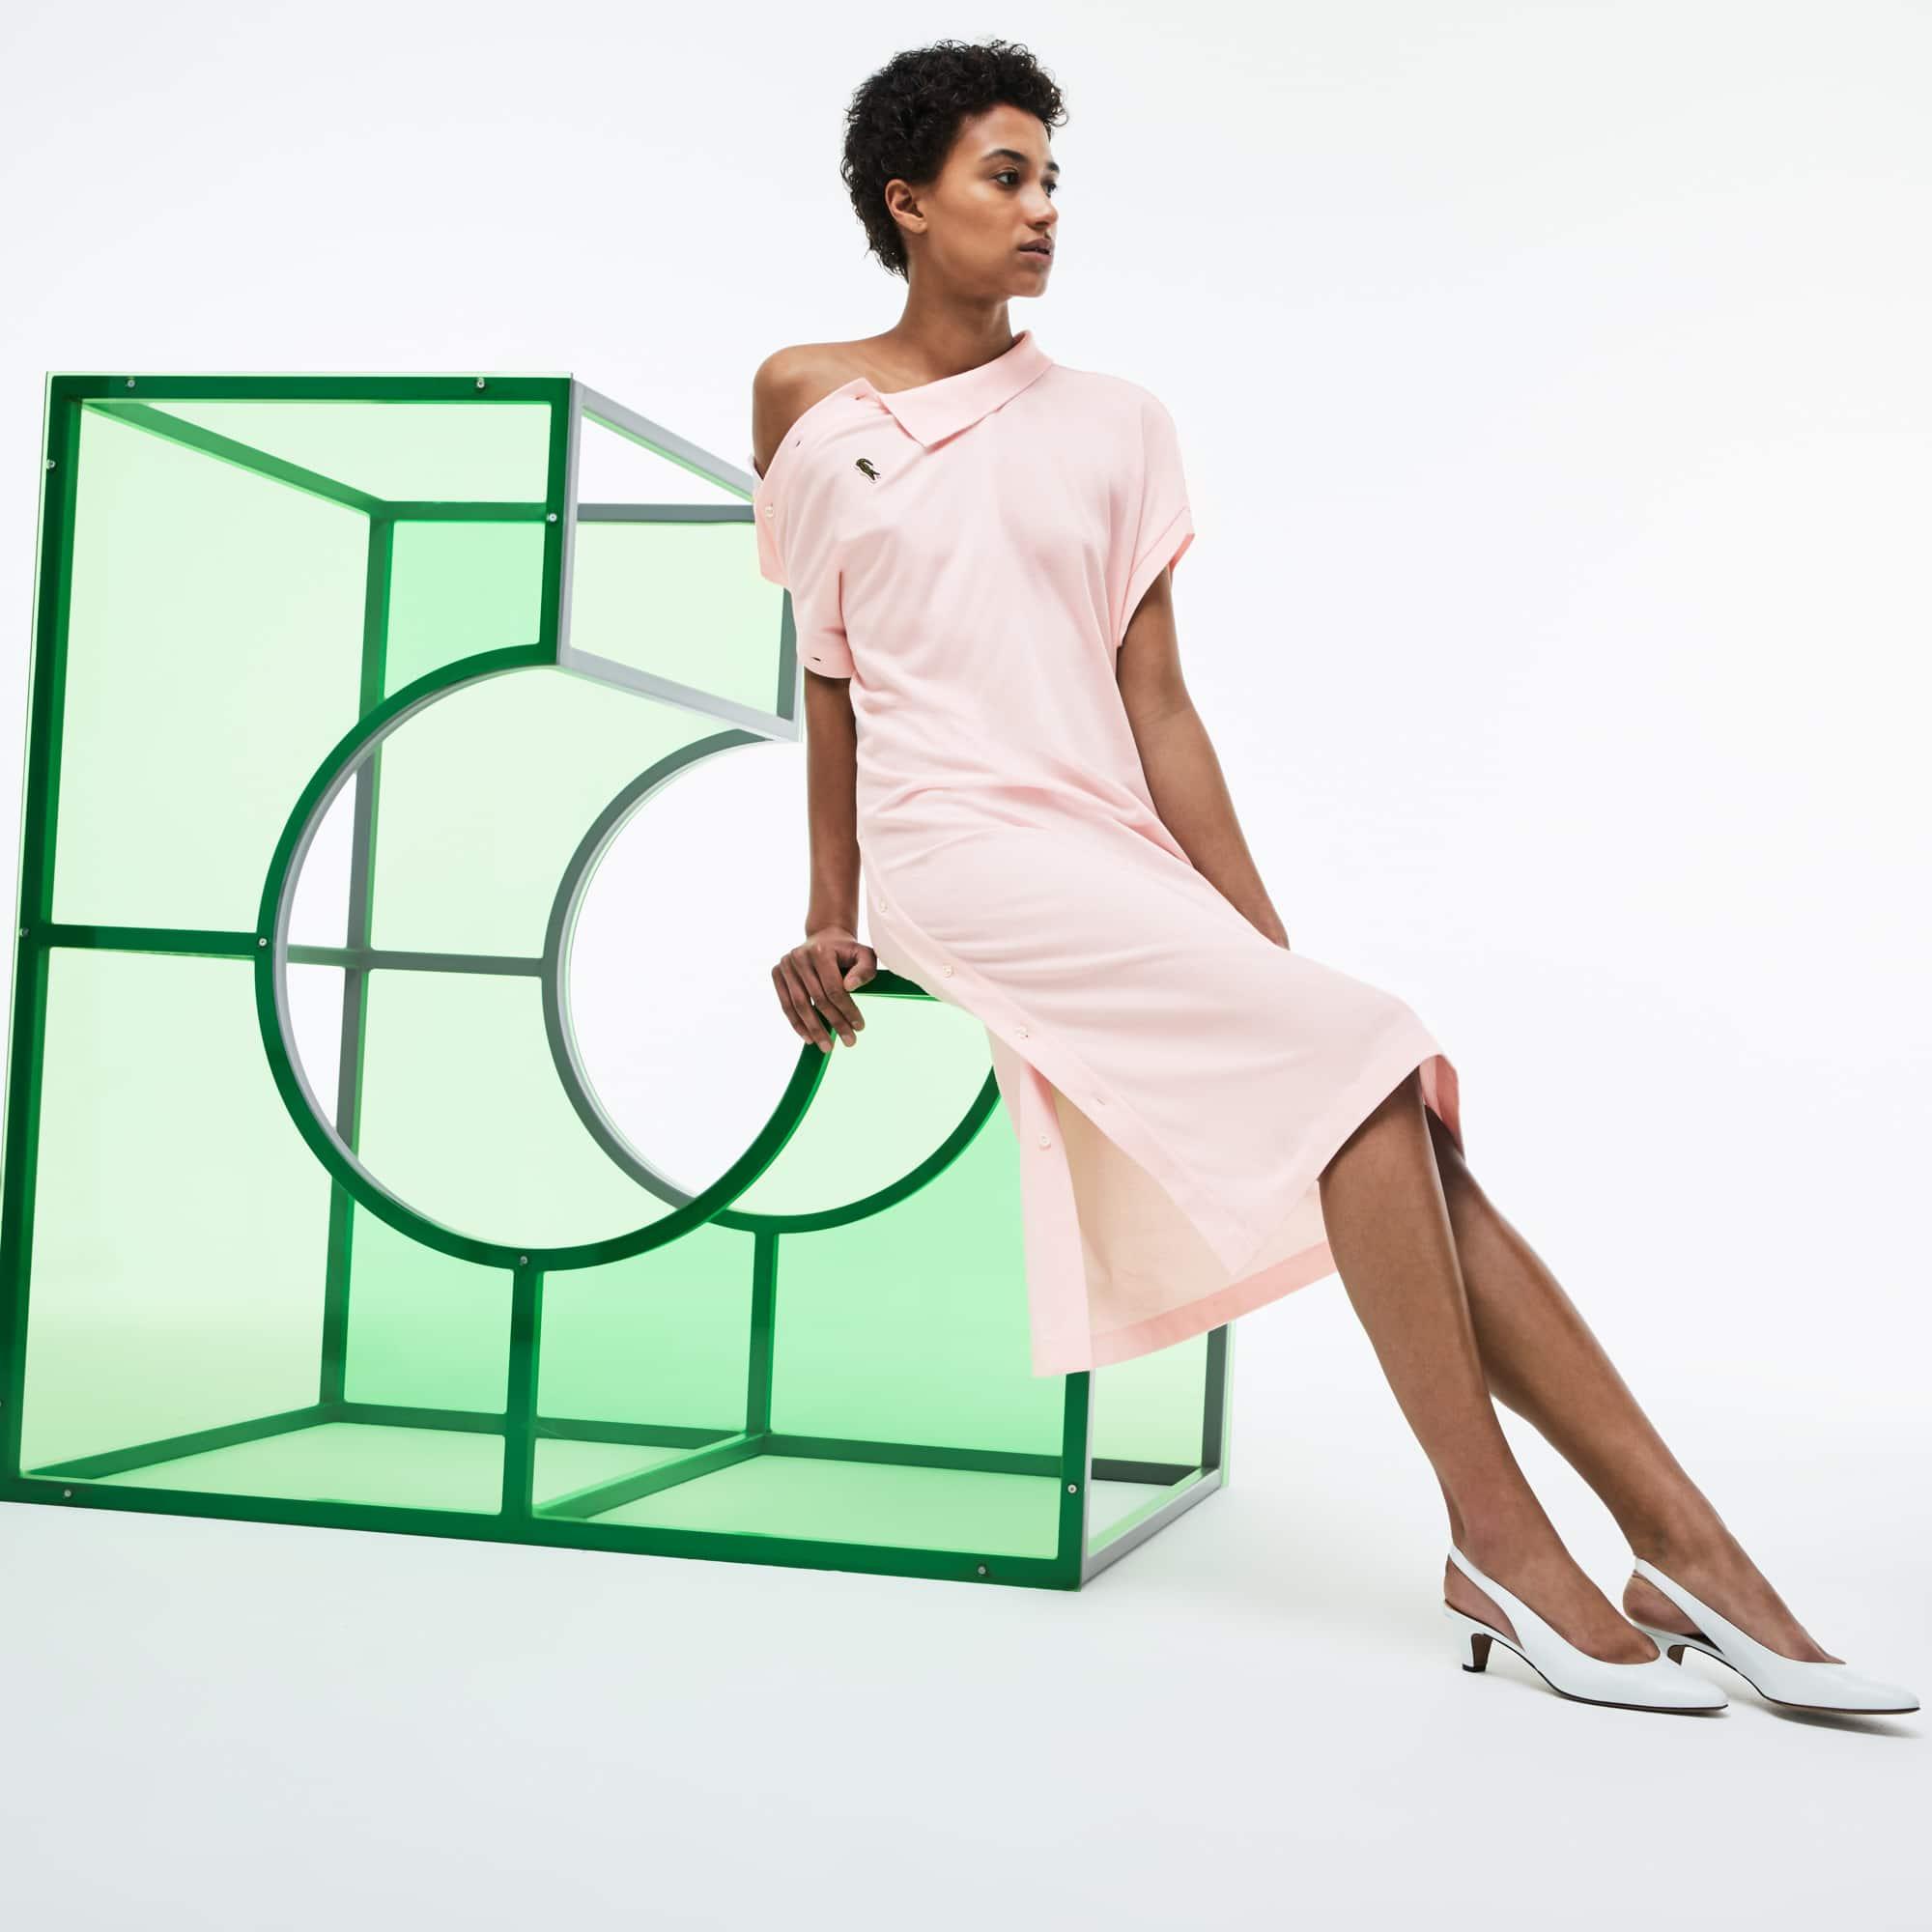 Damen Asymmetrisches Polokleid aus der Fashion Show Kollektion